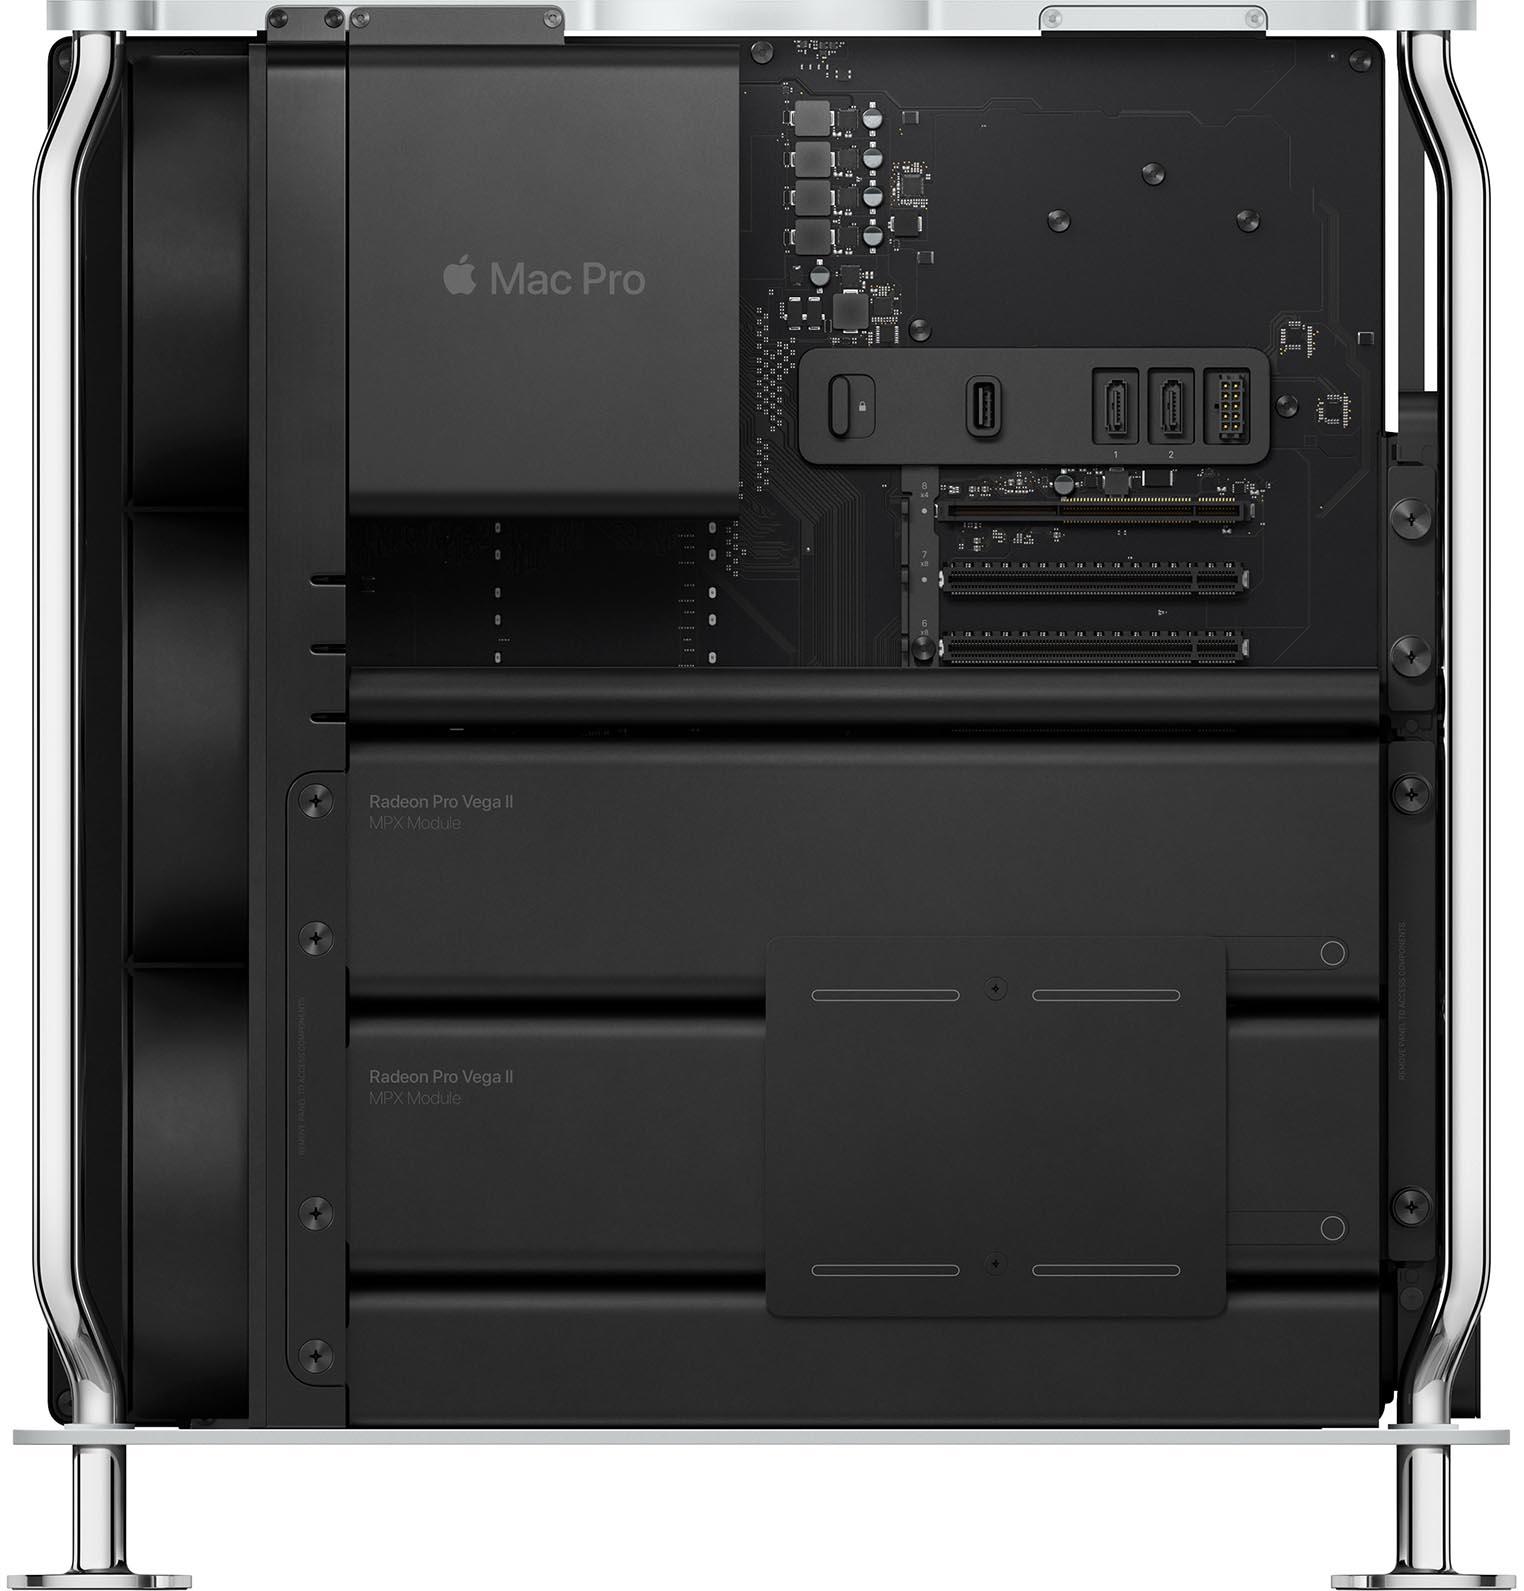 Mac Pro 2019 composants